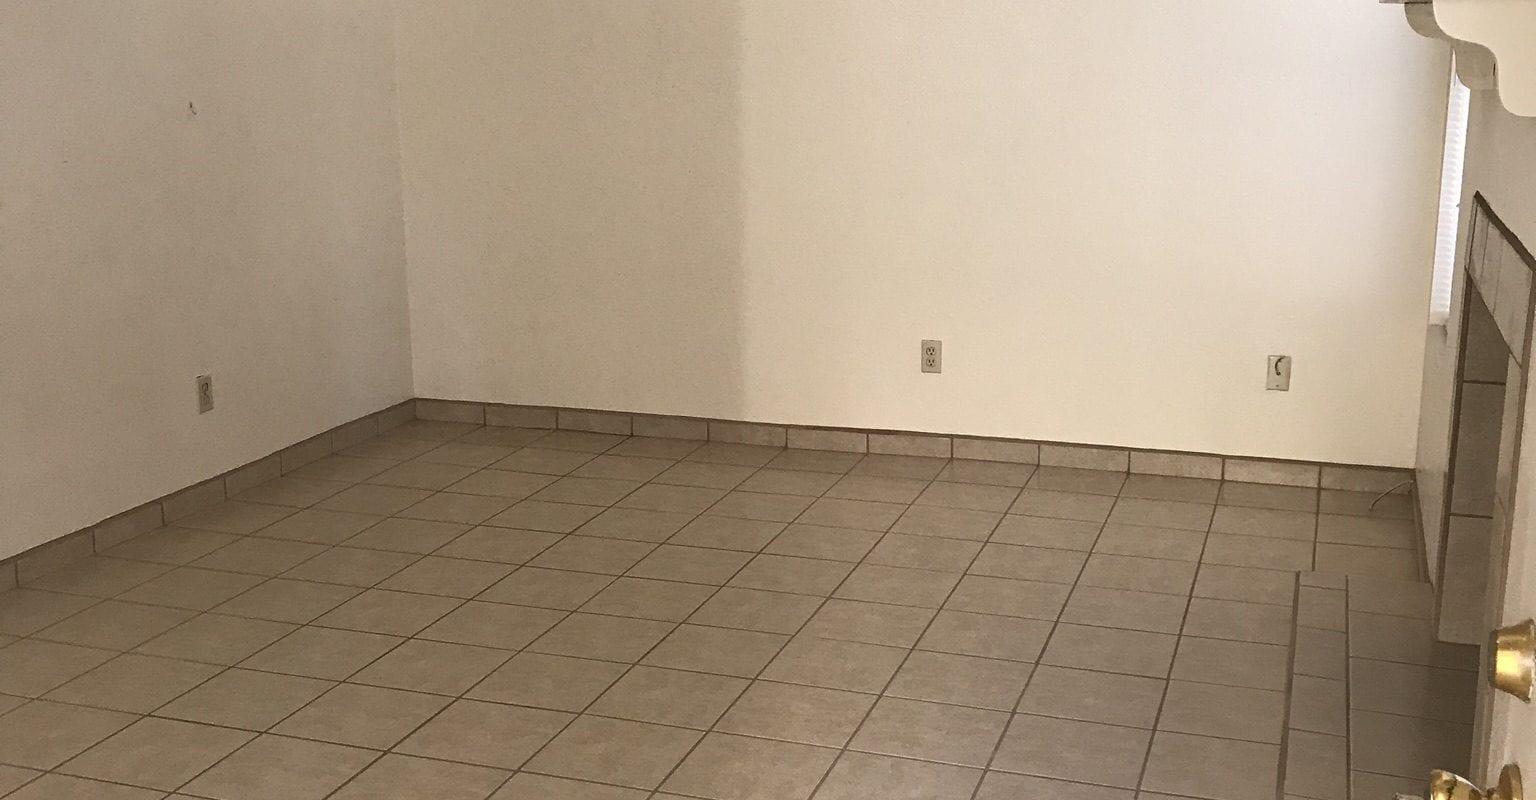 199 W. Madrid Ave. #F2, Las Cruces, NM  88005